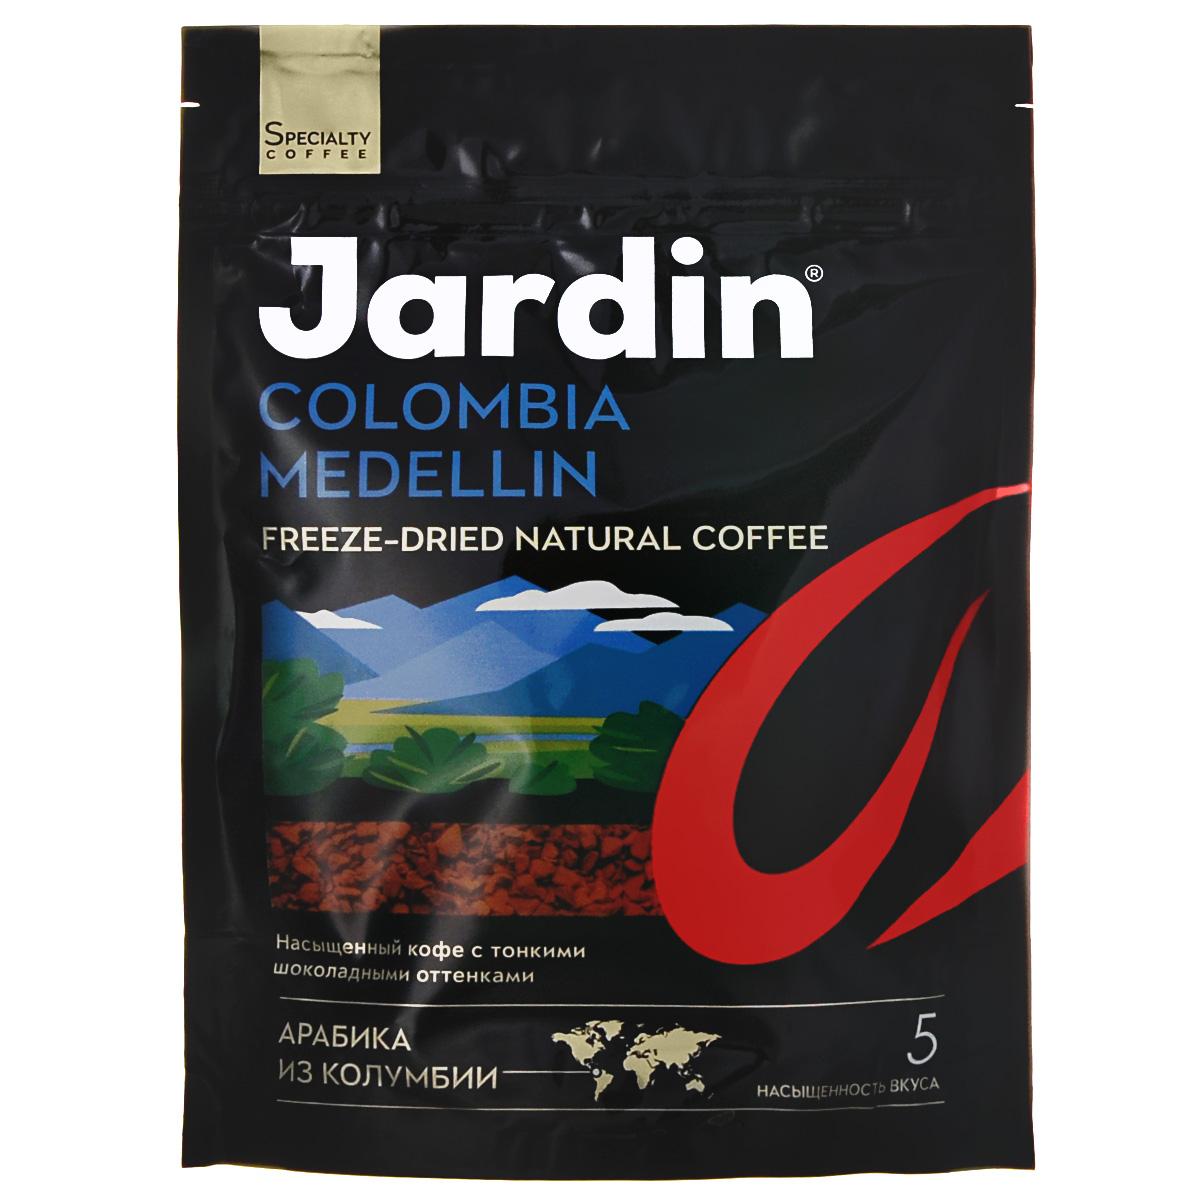 Jardin Colombia Medellin кофе растворимый, 75 г (м/у)